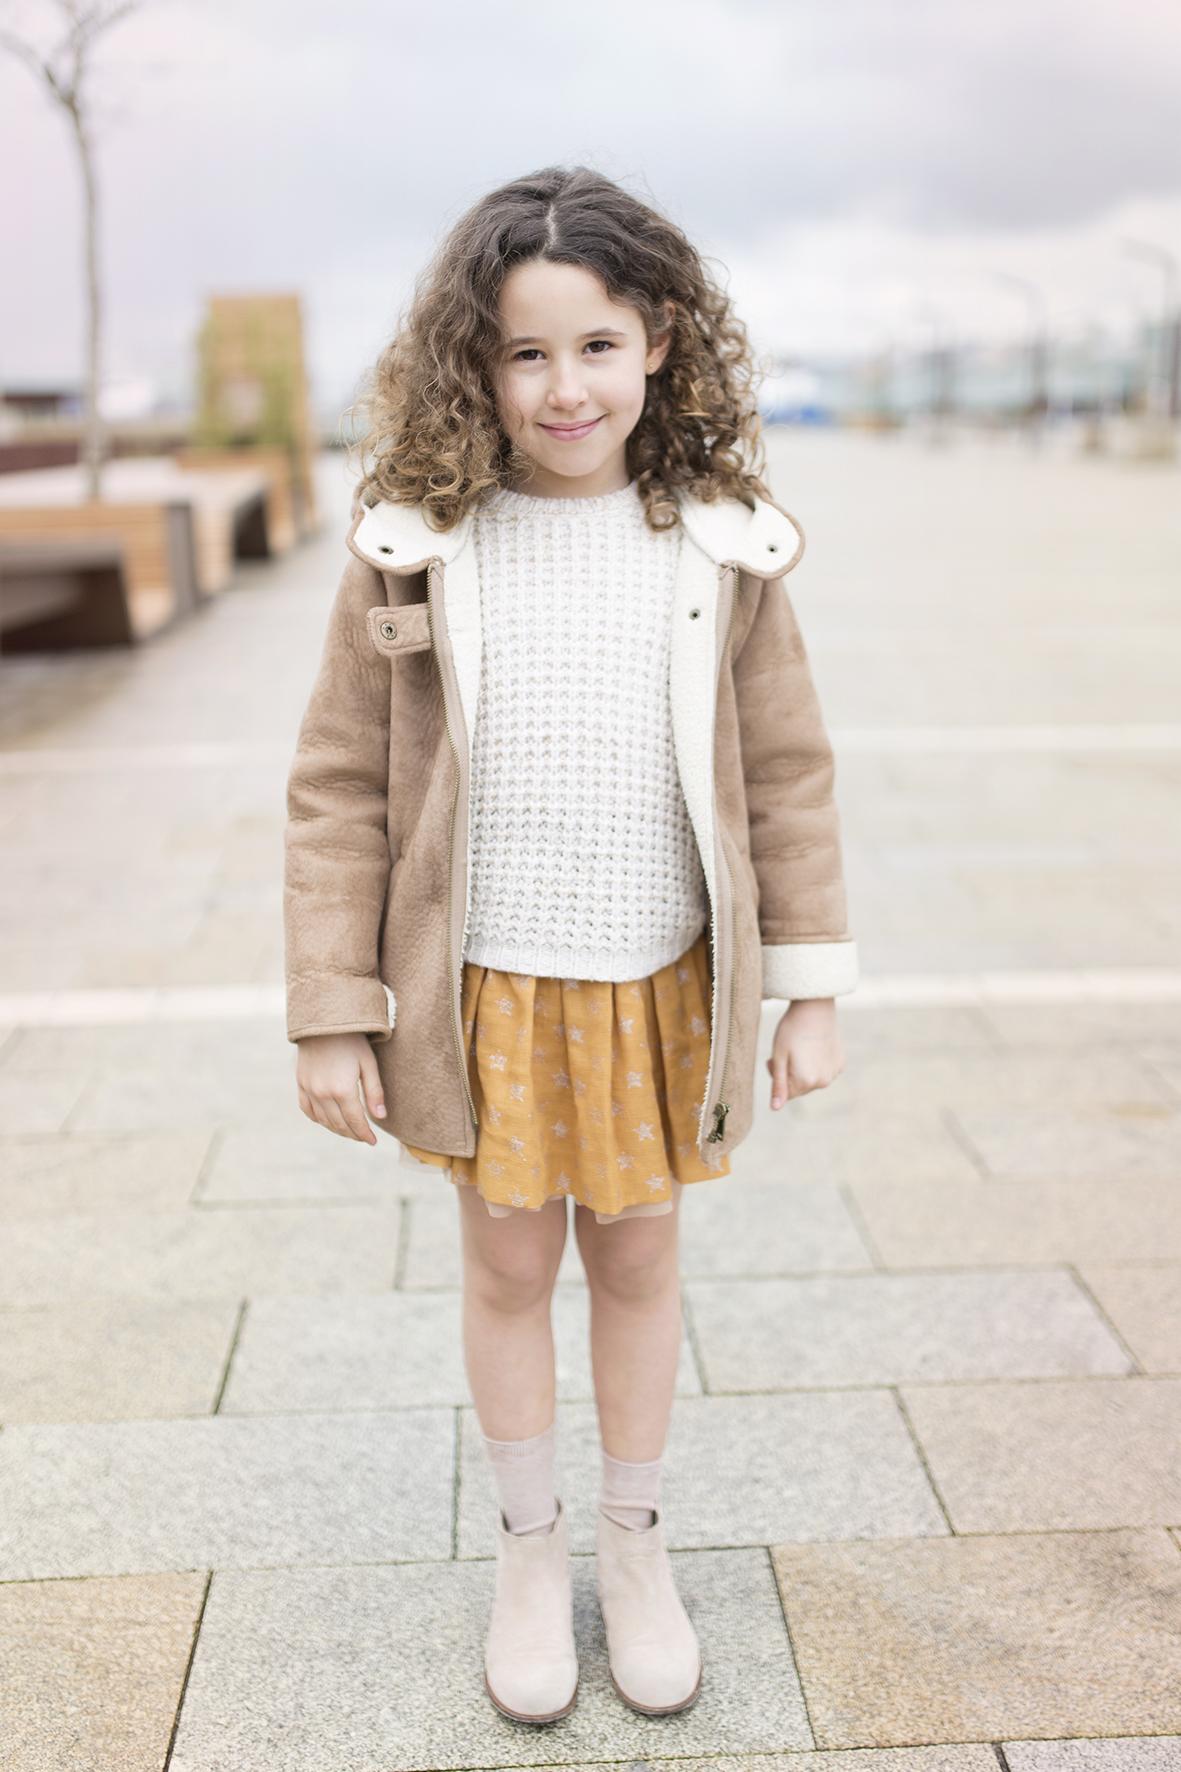 Zara -minime-moda-coruña-zara soft-jimena-streetstyle- kids-blogger-descalzaporelparque-fashion